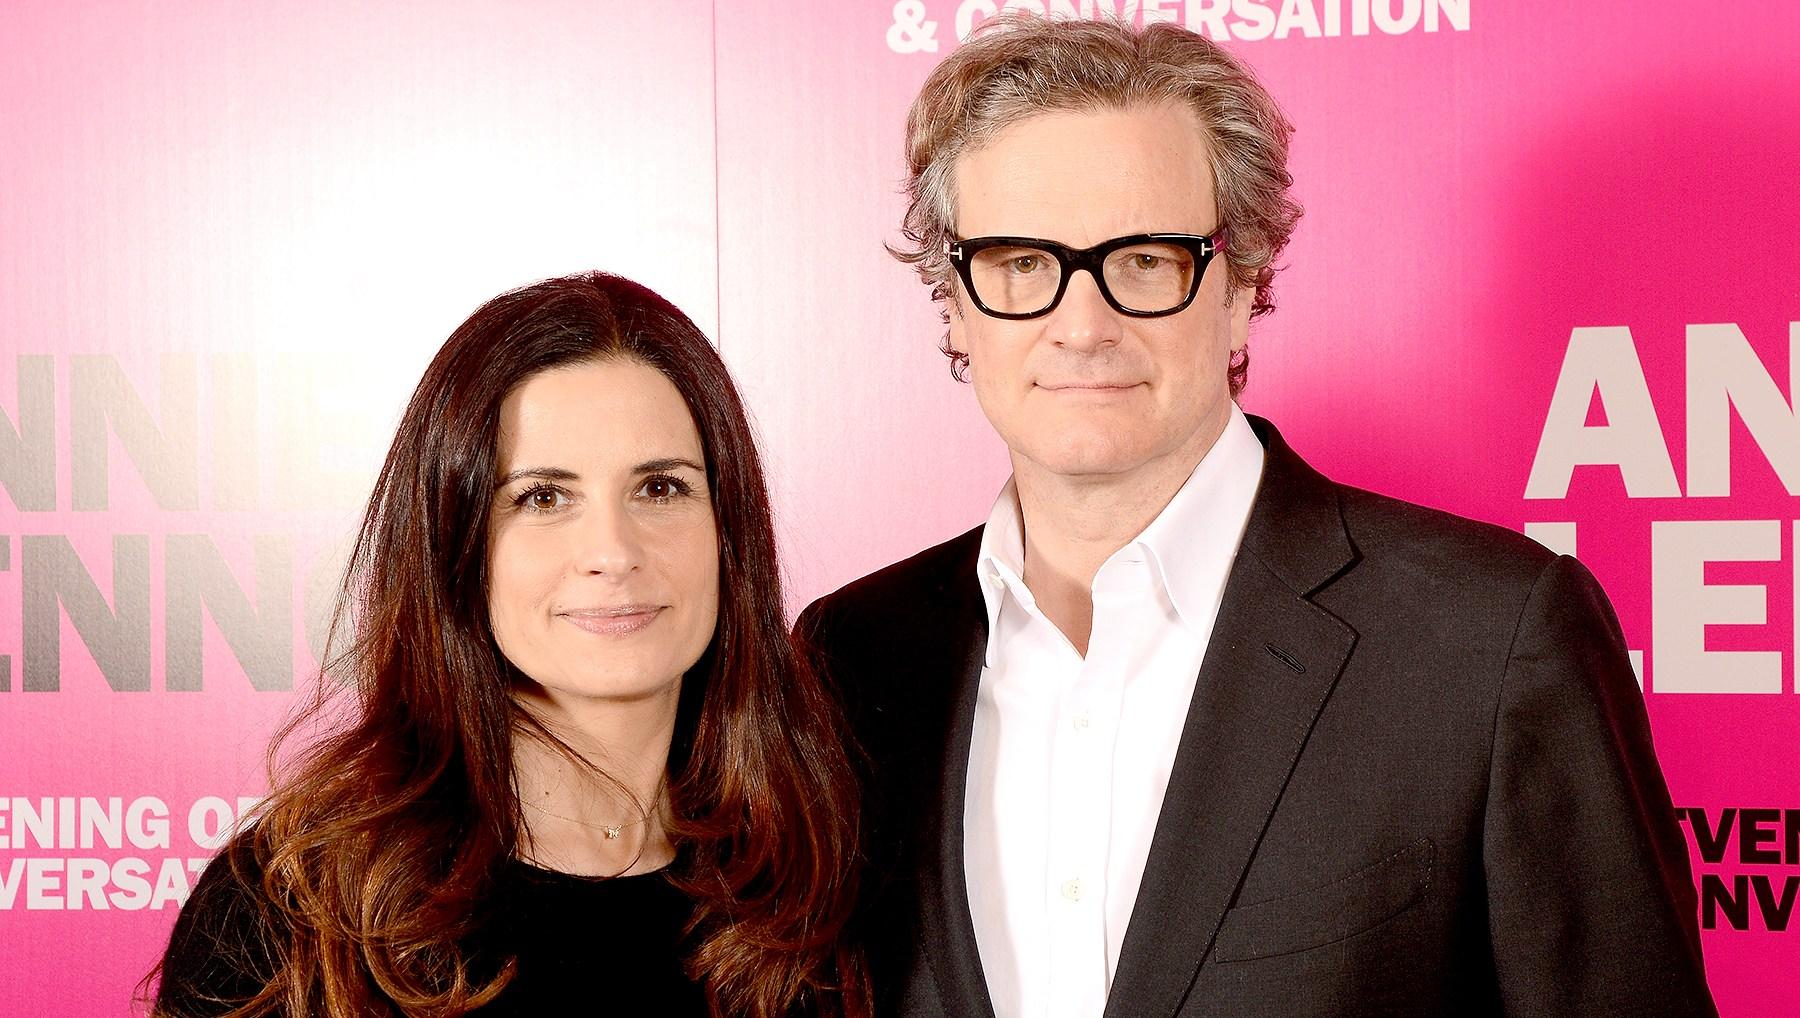 Livia-Firth-and-Colin-Firth